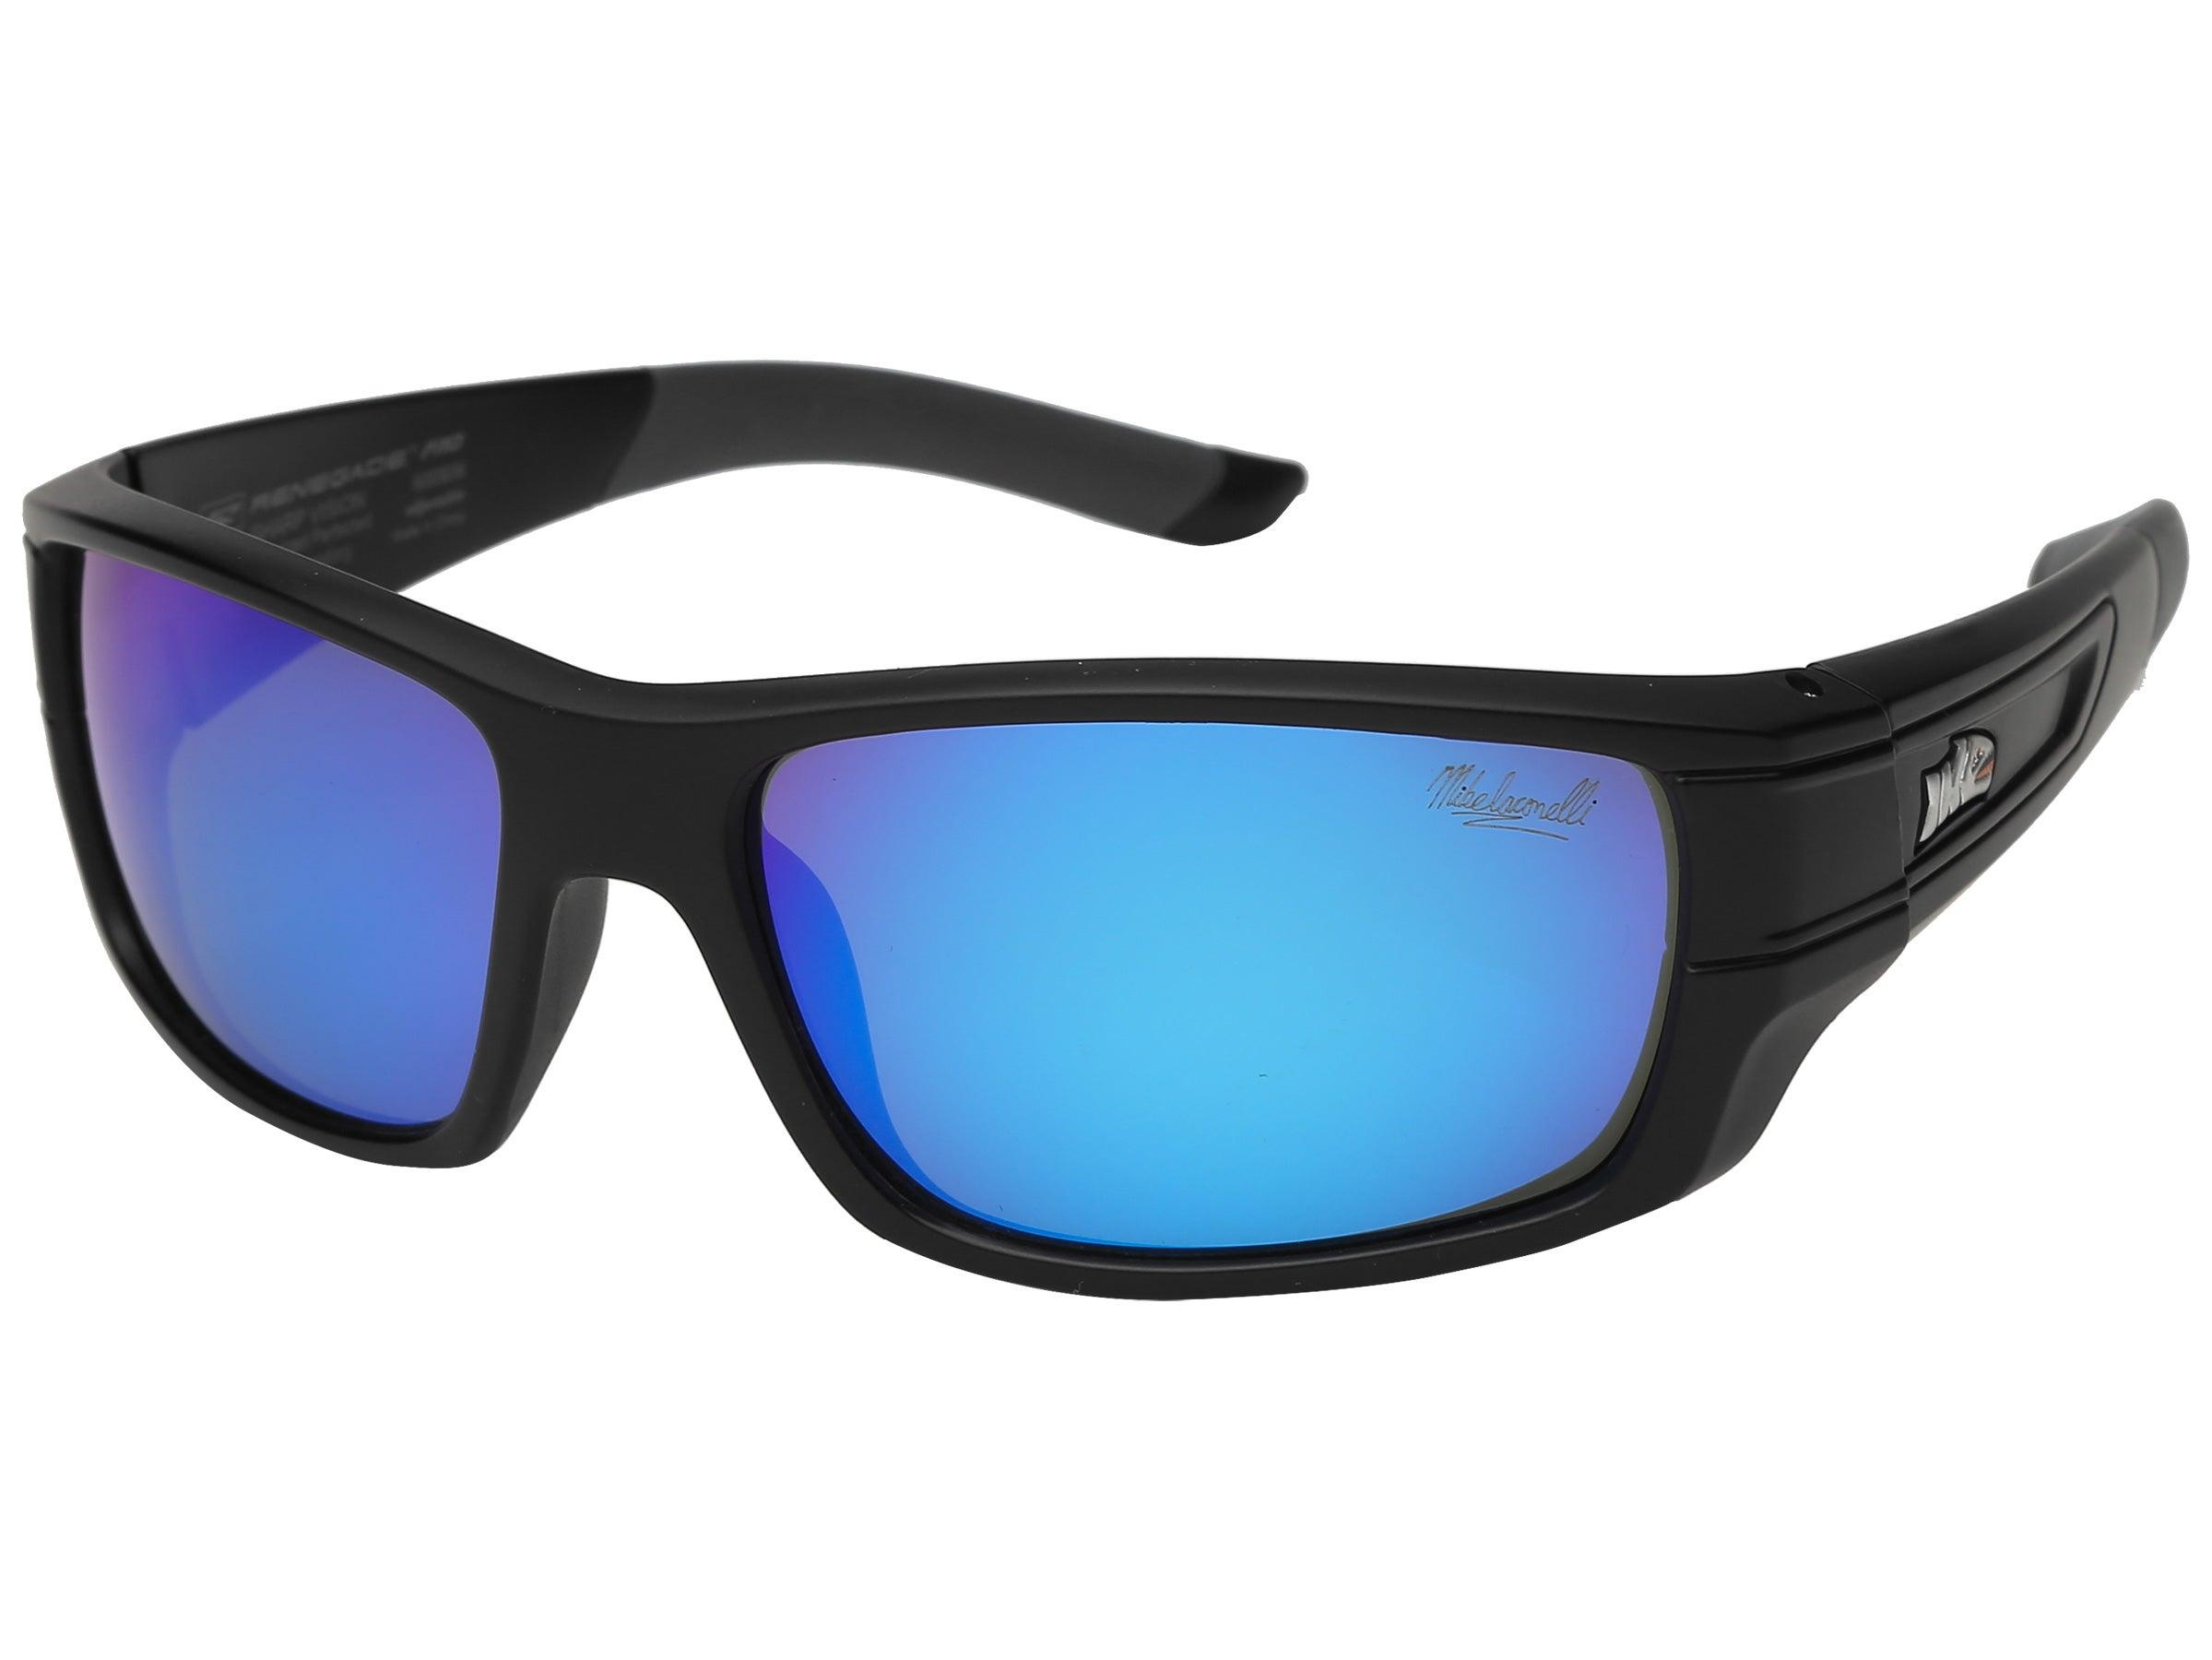 50e20401b4 Renegade Mike Iaconelli Series Sunglasses